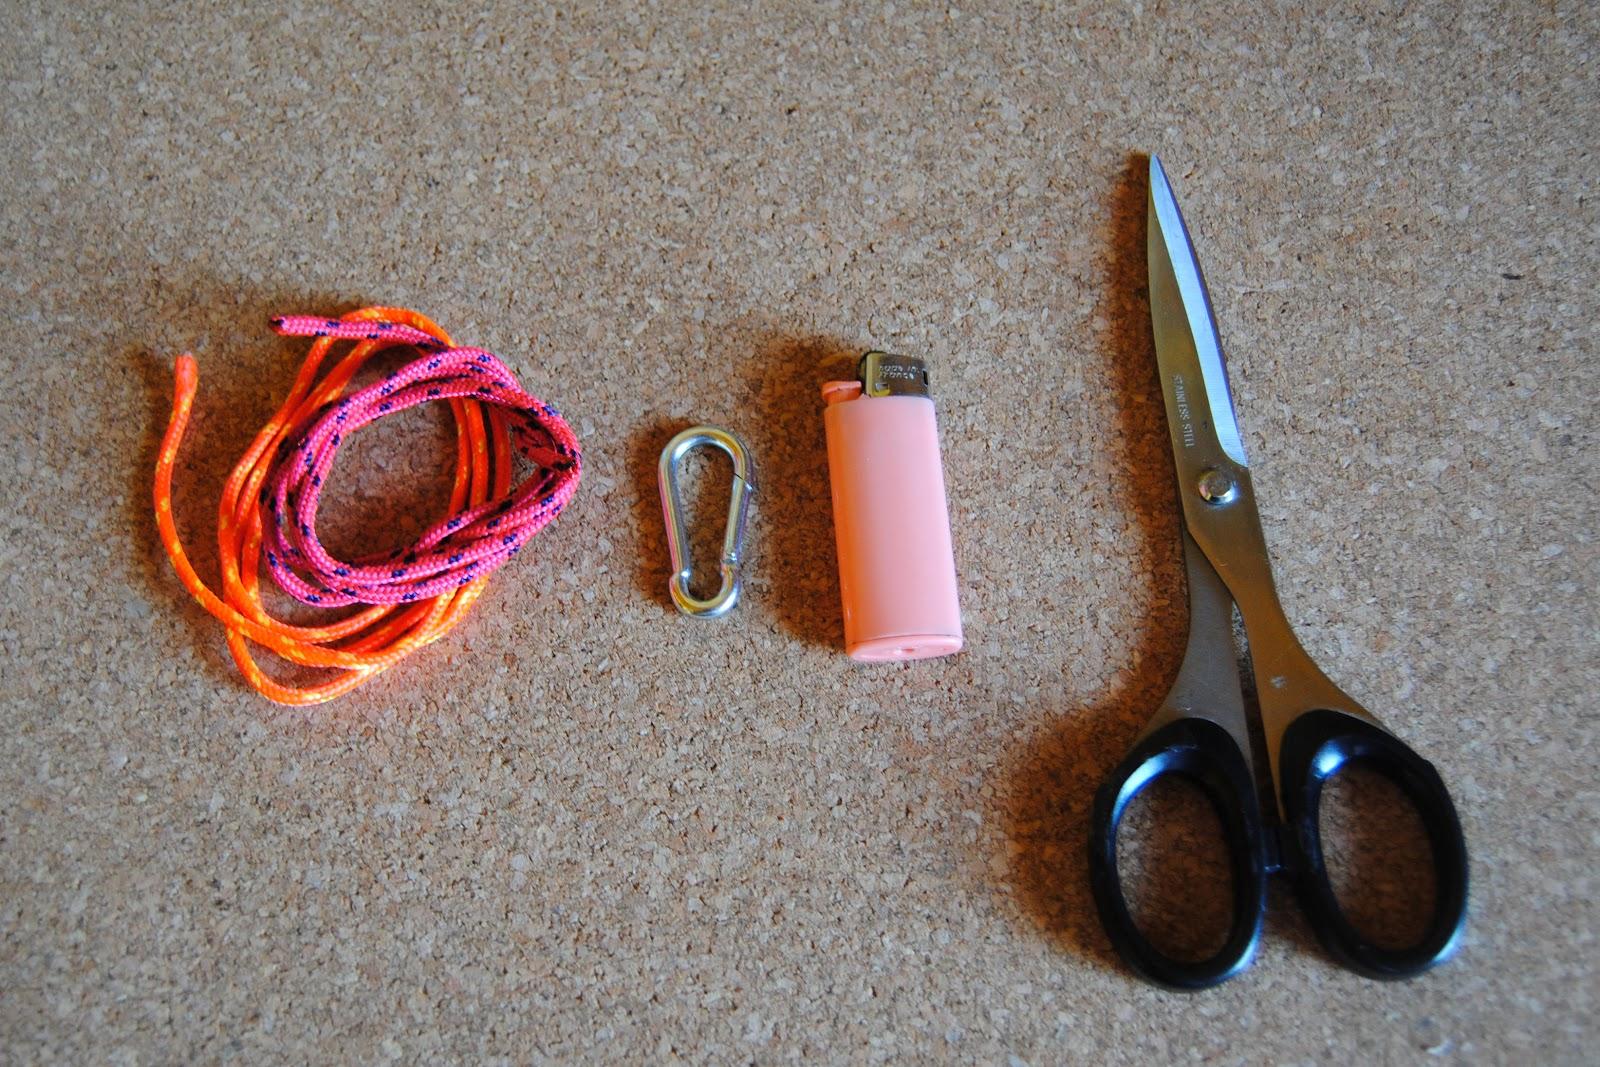 Giallolimoneverdemelarosaconfetto climbing bracelets 2 0 for Nodo invisibile per unire due fili di lana